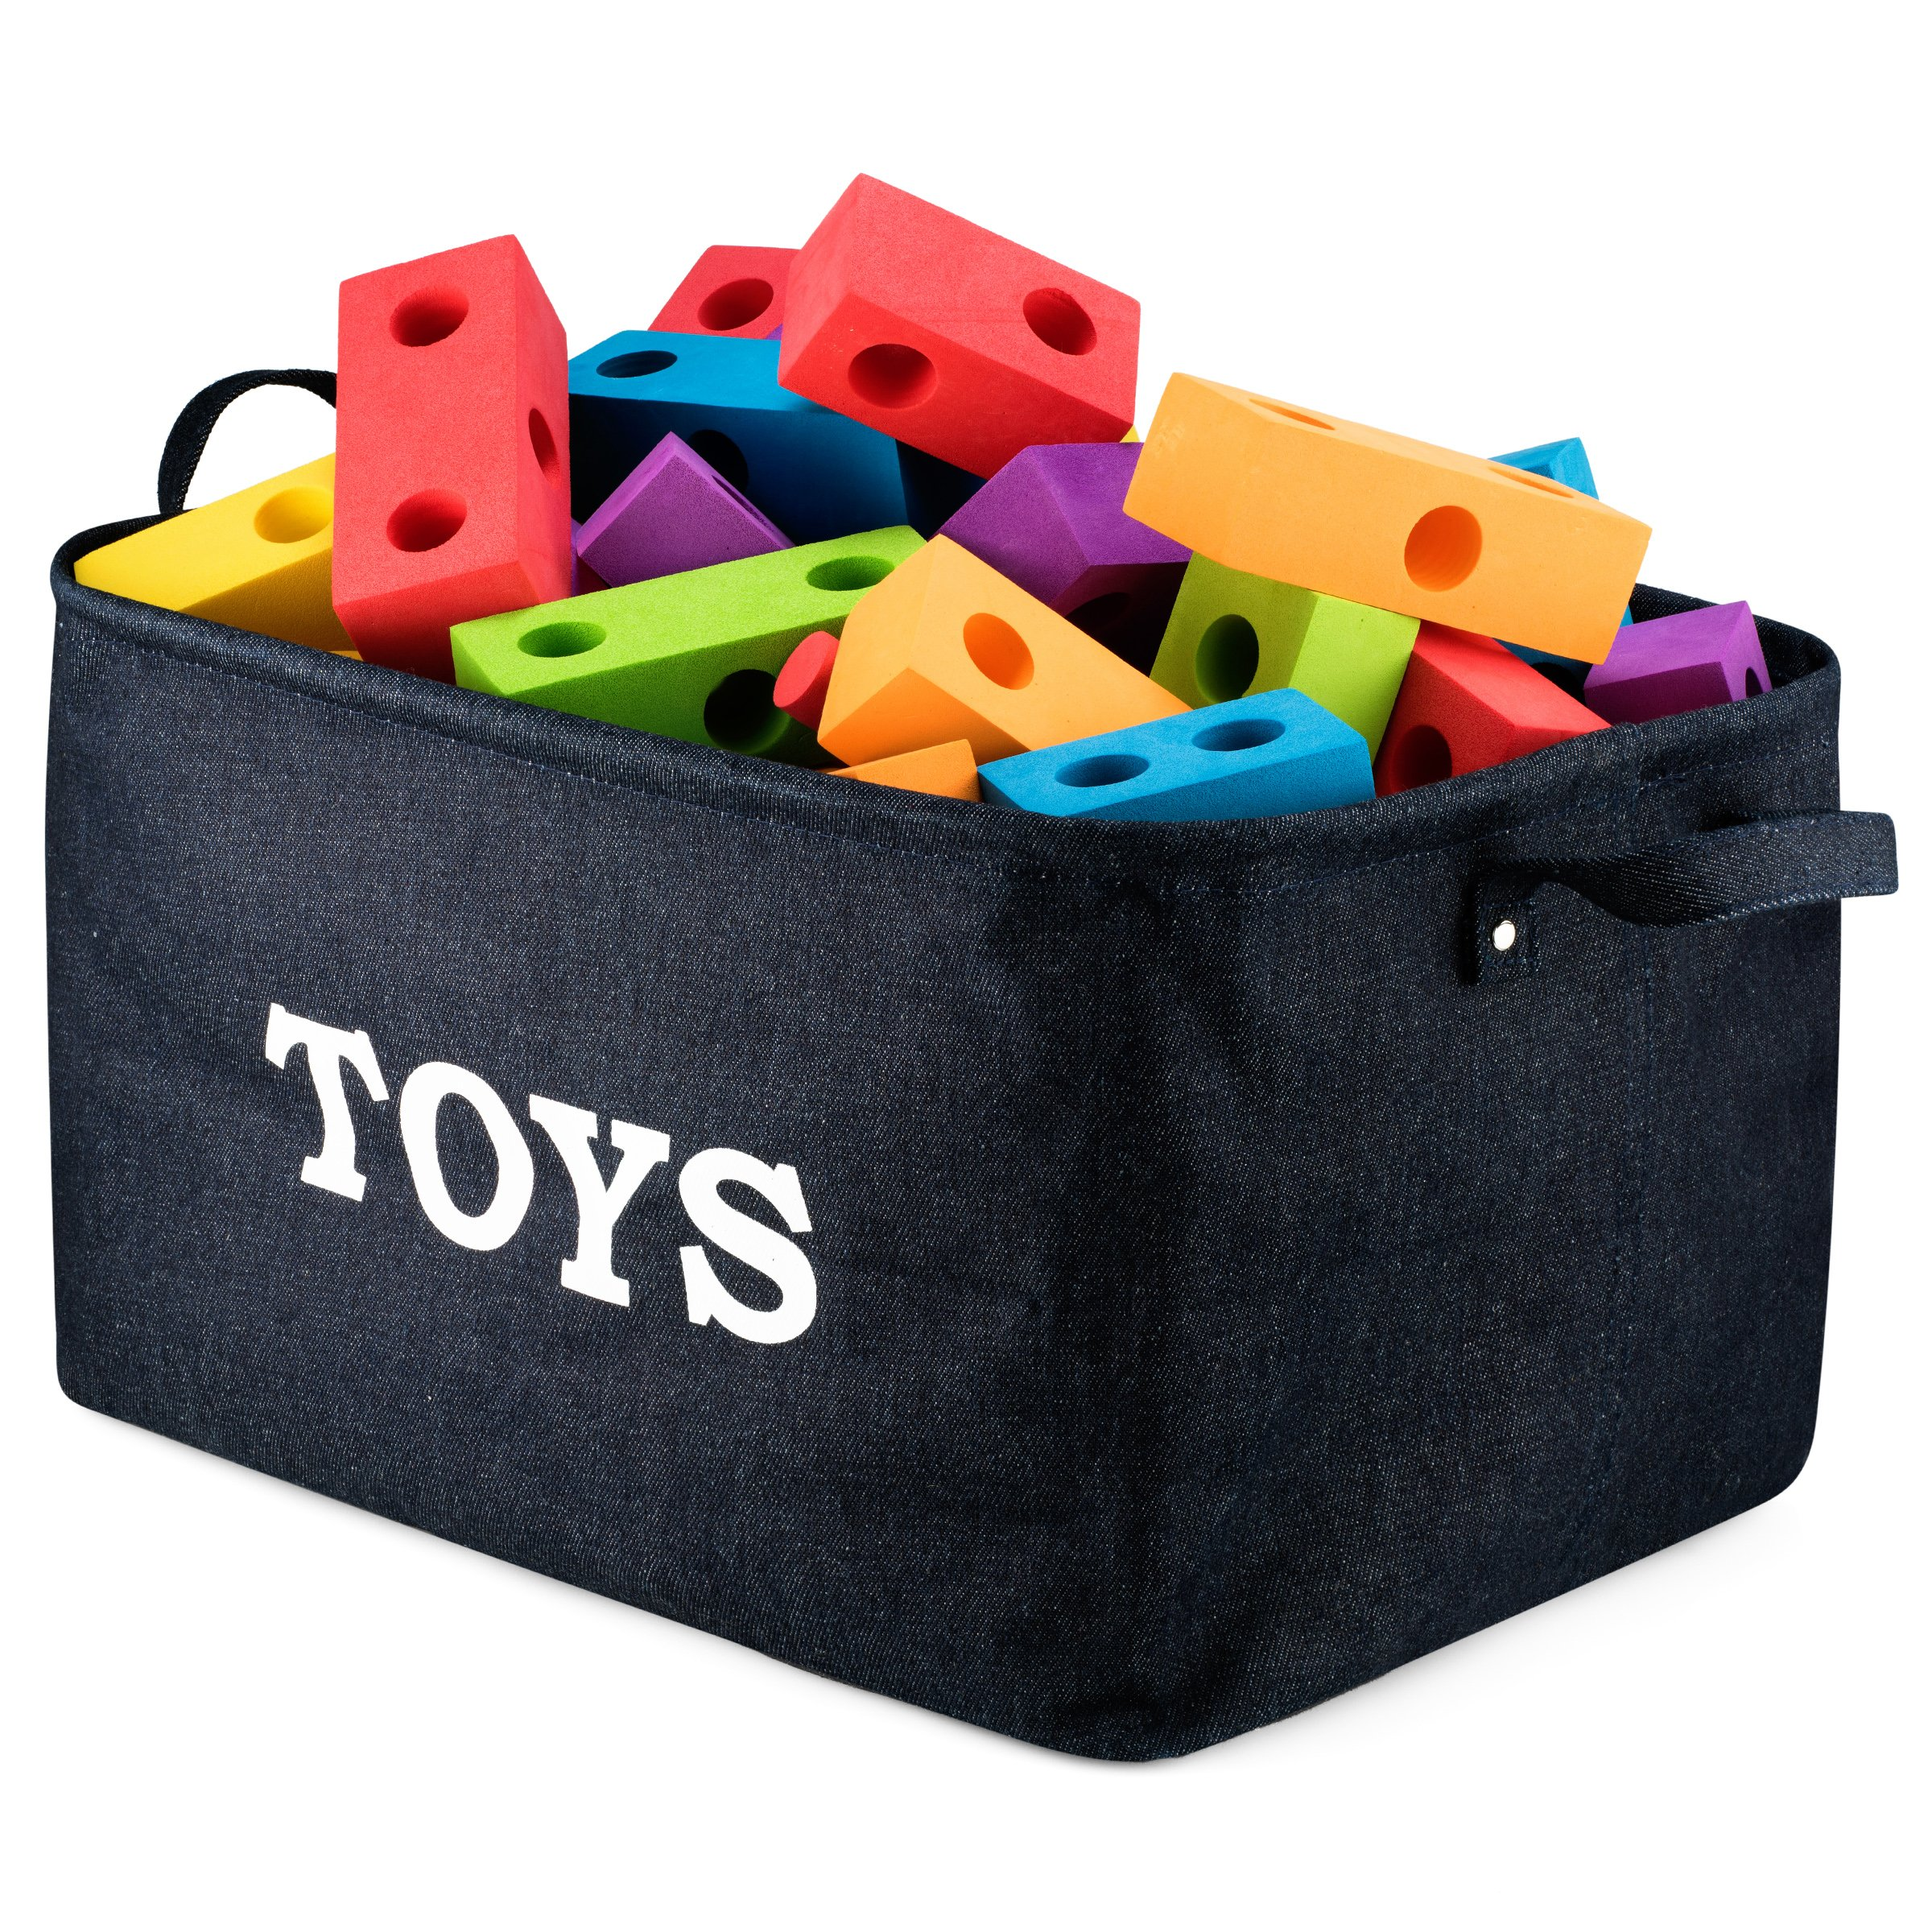 ''Toys Storage'' Bin 17'' Large Collapsible Toy Storage Basket ,Perfect Nursery Bin - Denim Toy Storage Basket for Organizing Baby Toys, Kids Toys, Baby Clothing, Children Books, Baby Gift Baskets